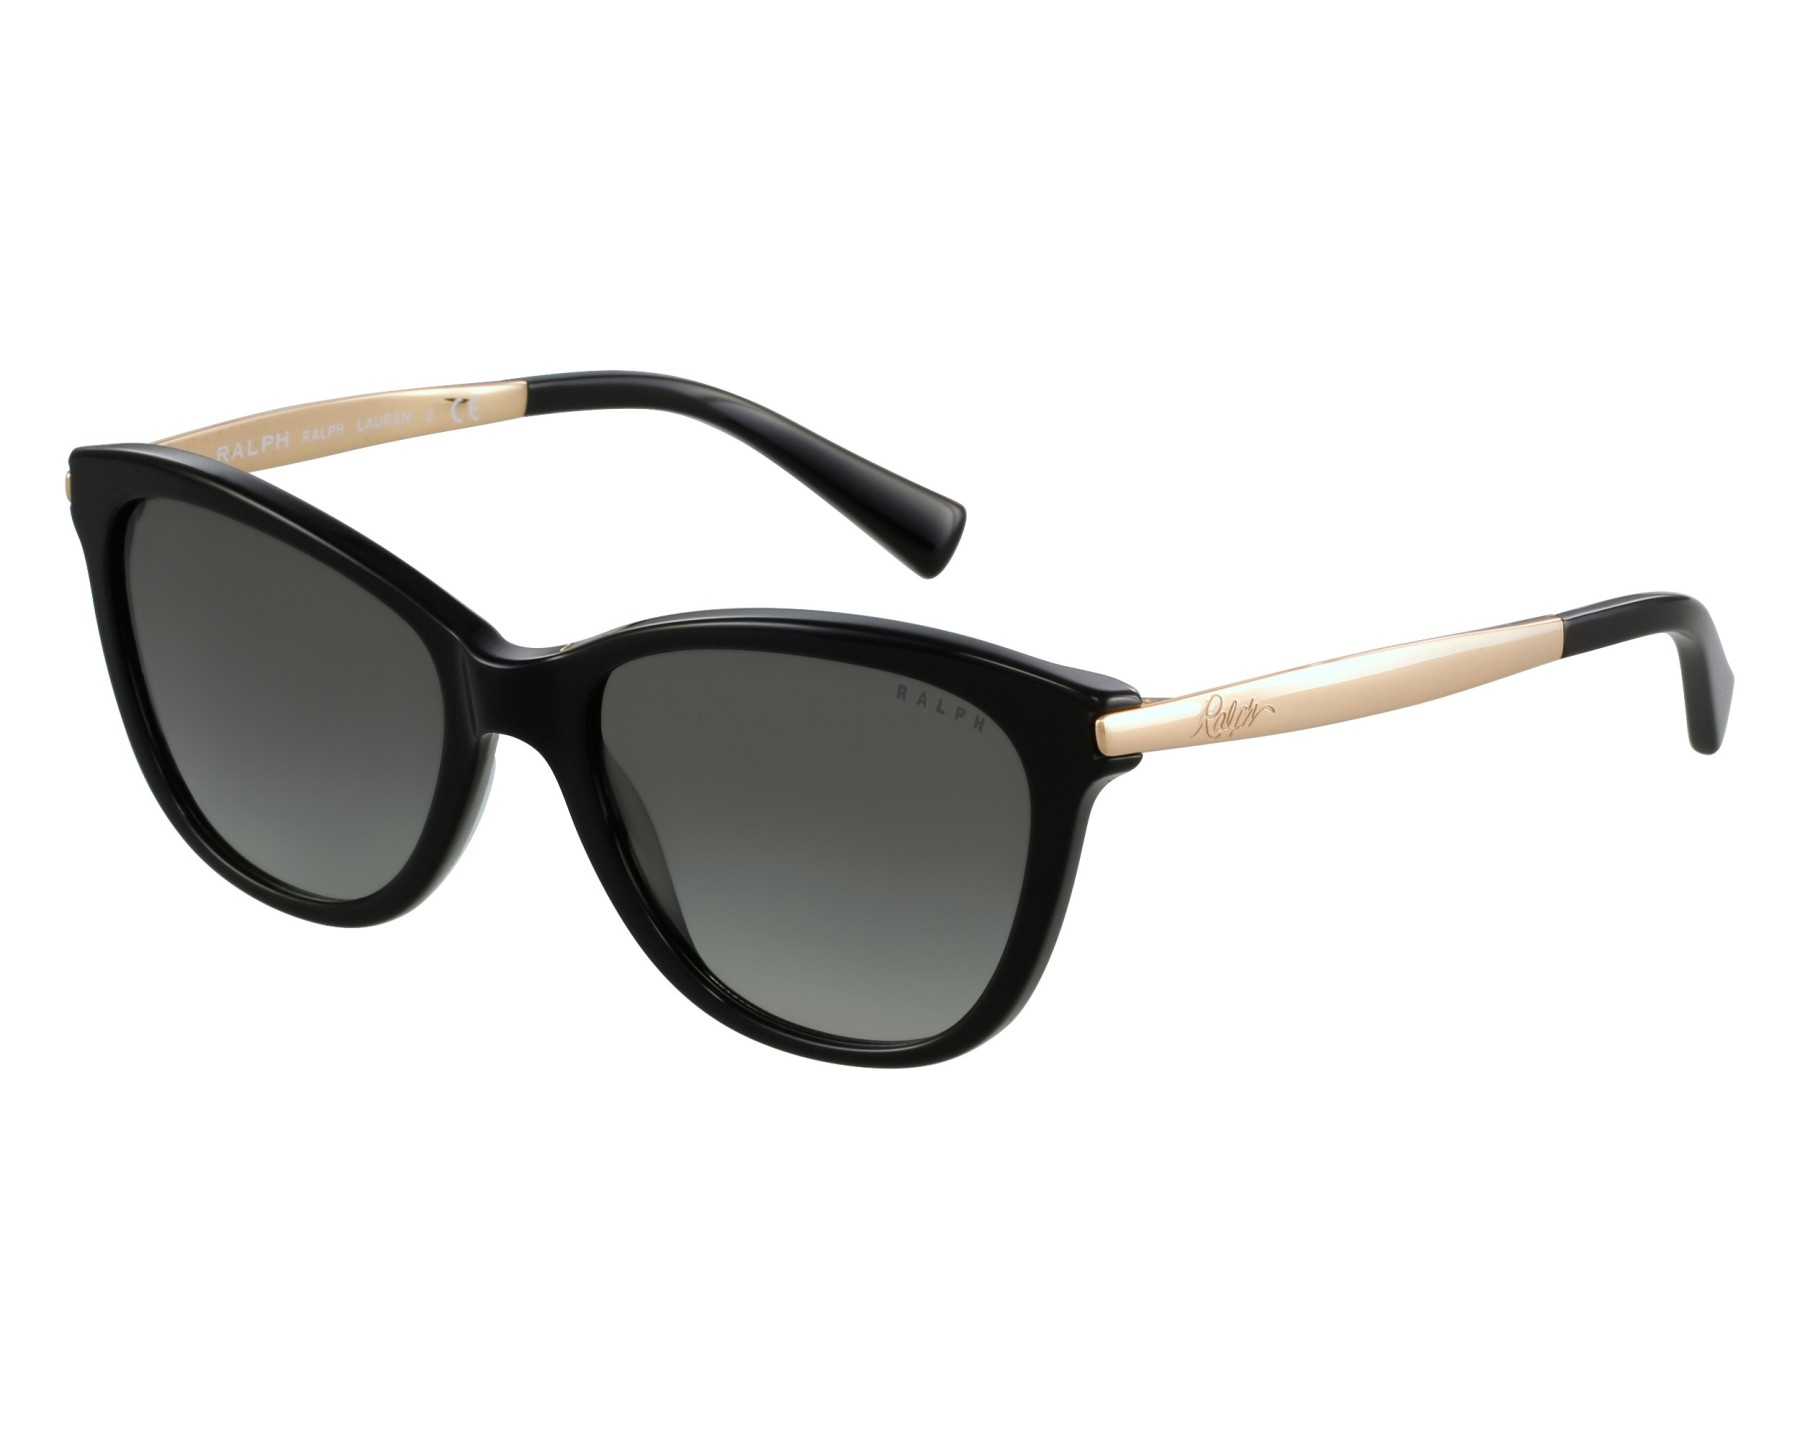 Ralph Lauren Sunglasses RA-5201 1265/11 Black